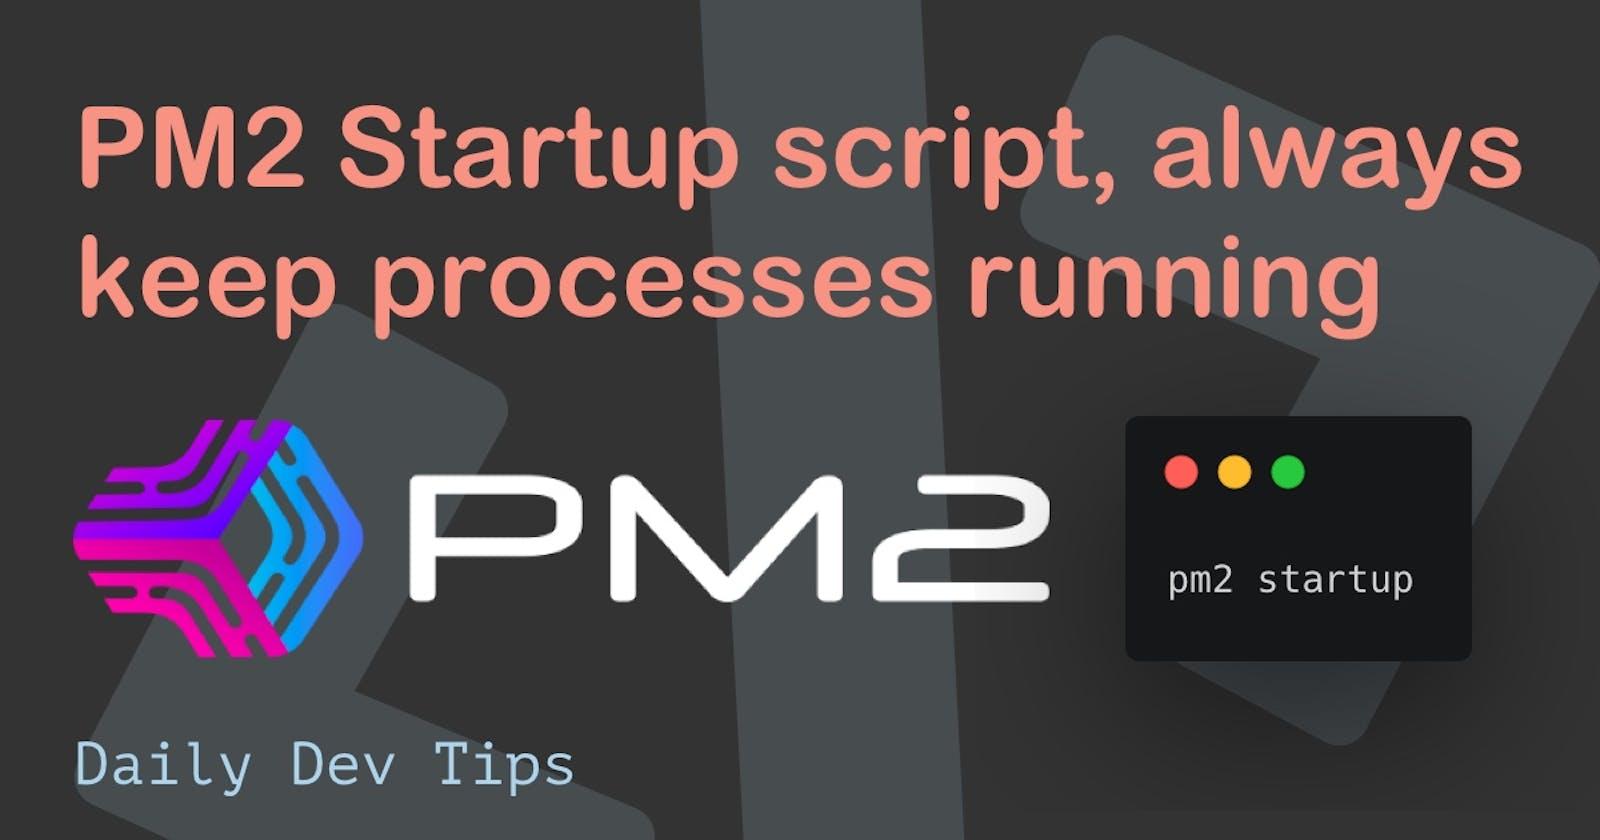 PM2 Startup script, always keep processes running